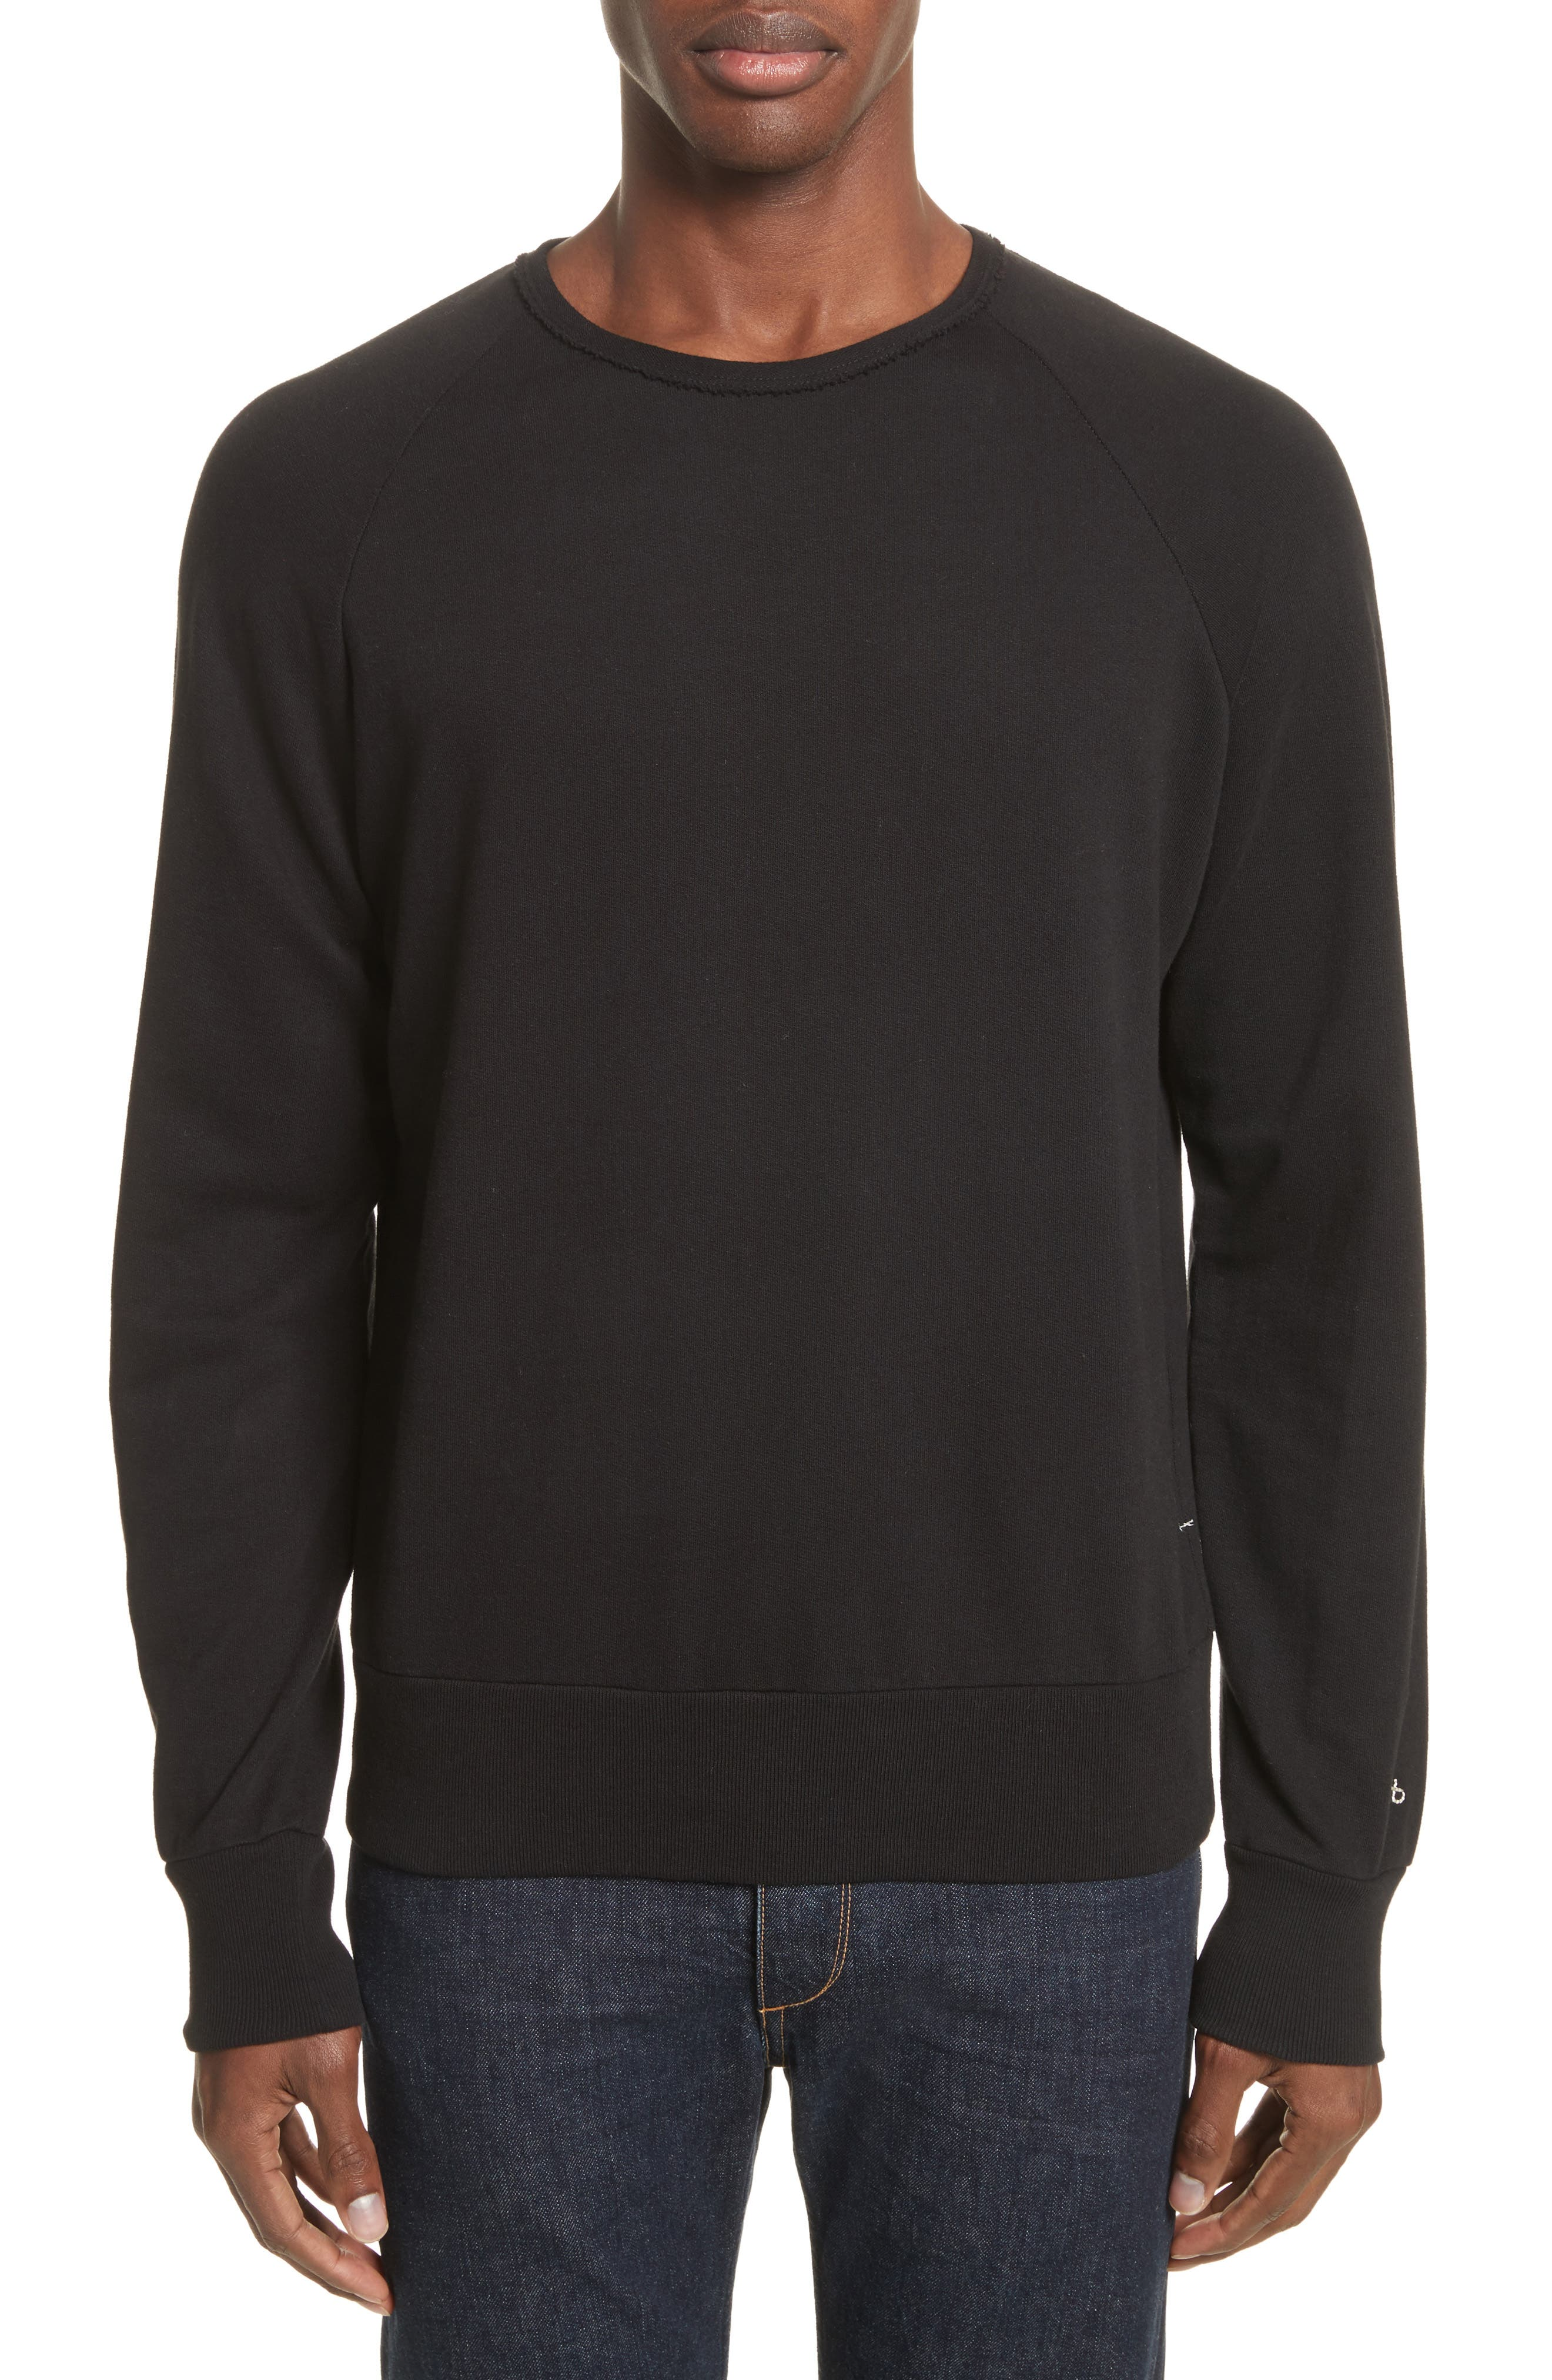 Standard Issue Crewneck Sweatshirt,                             Main thumbnail 1, color,